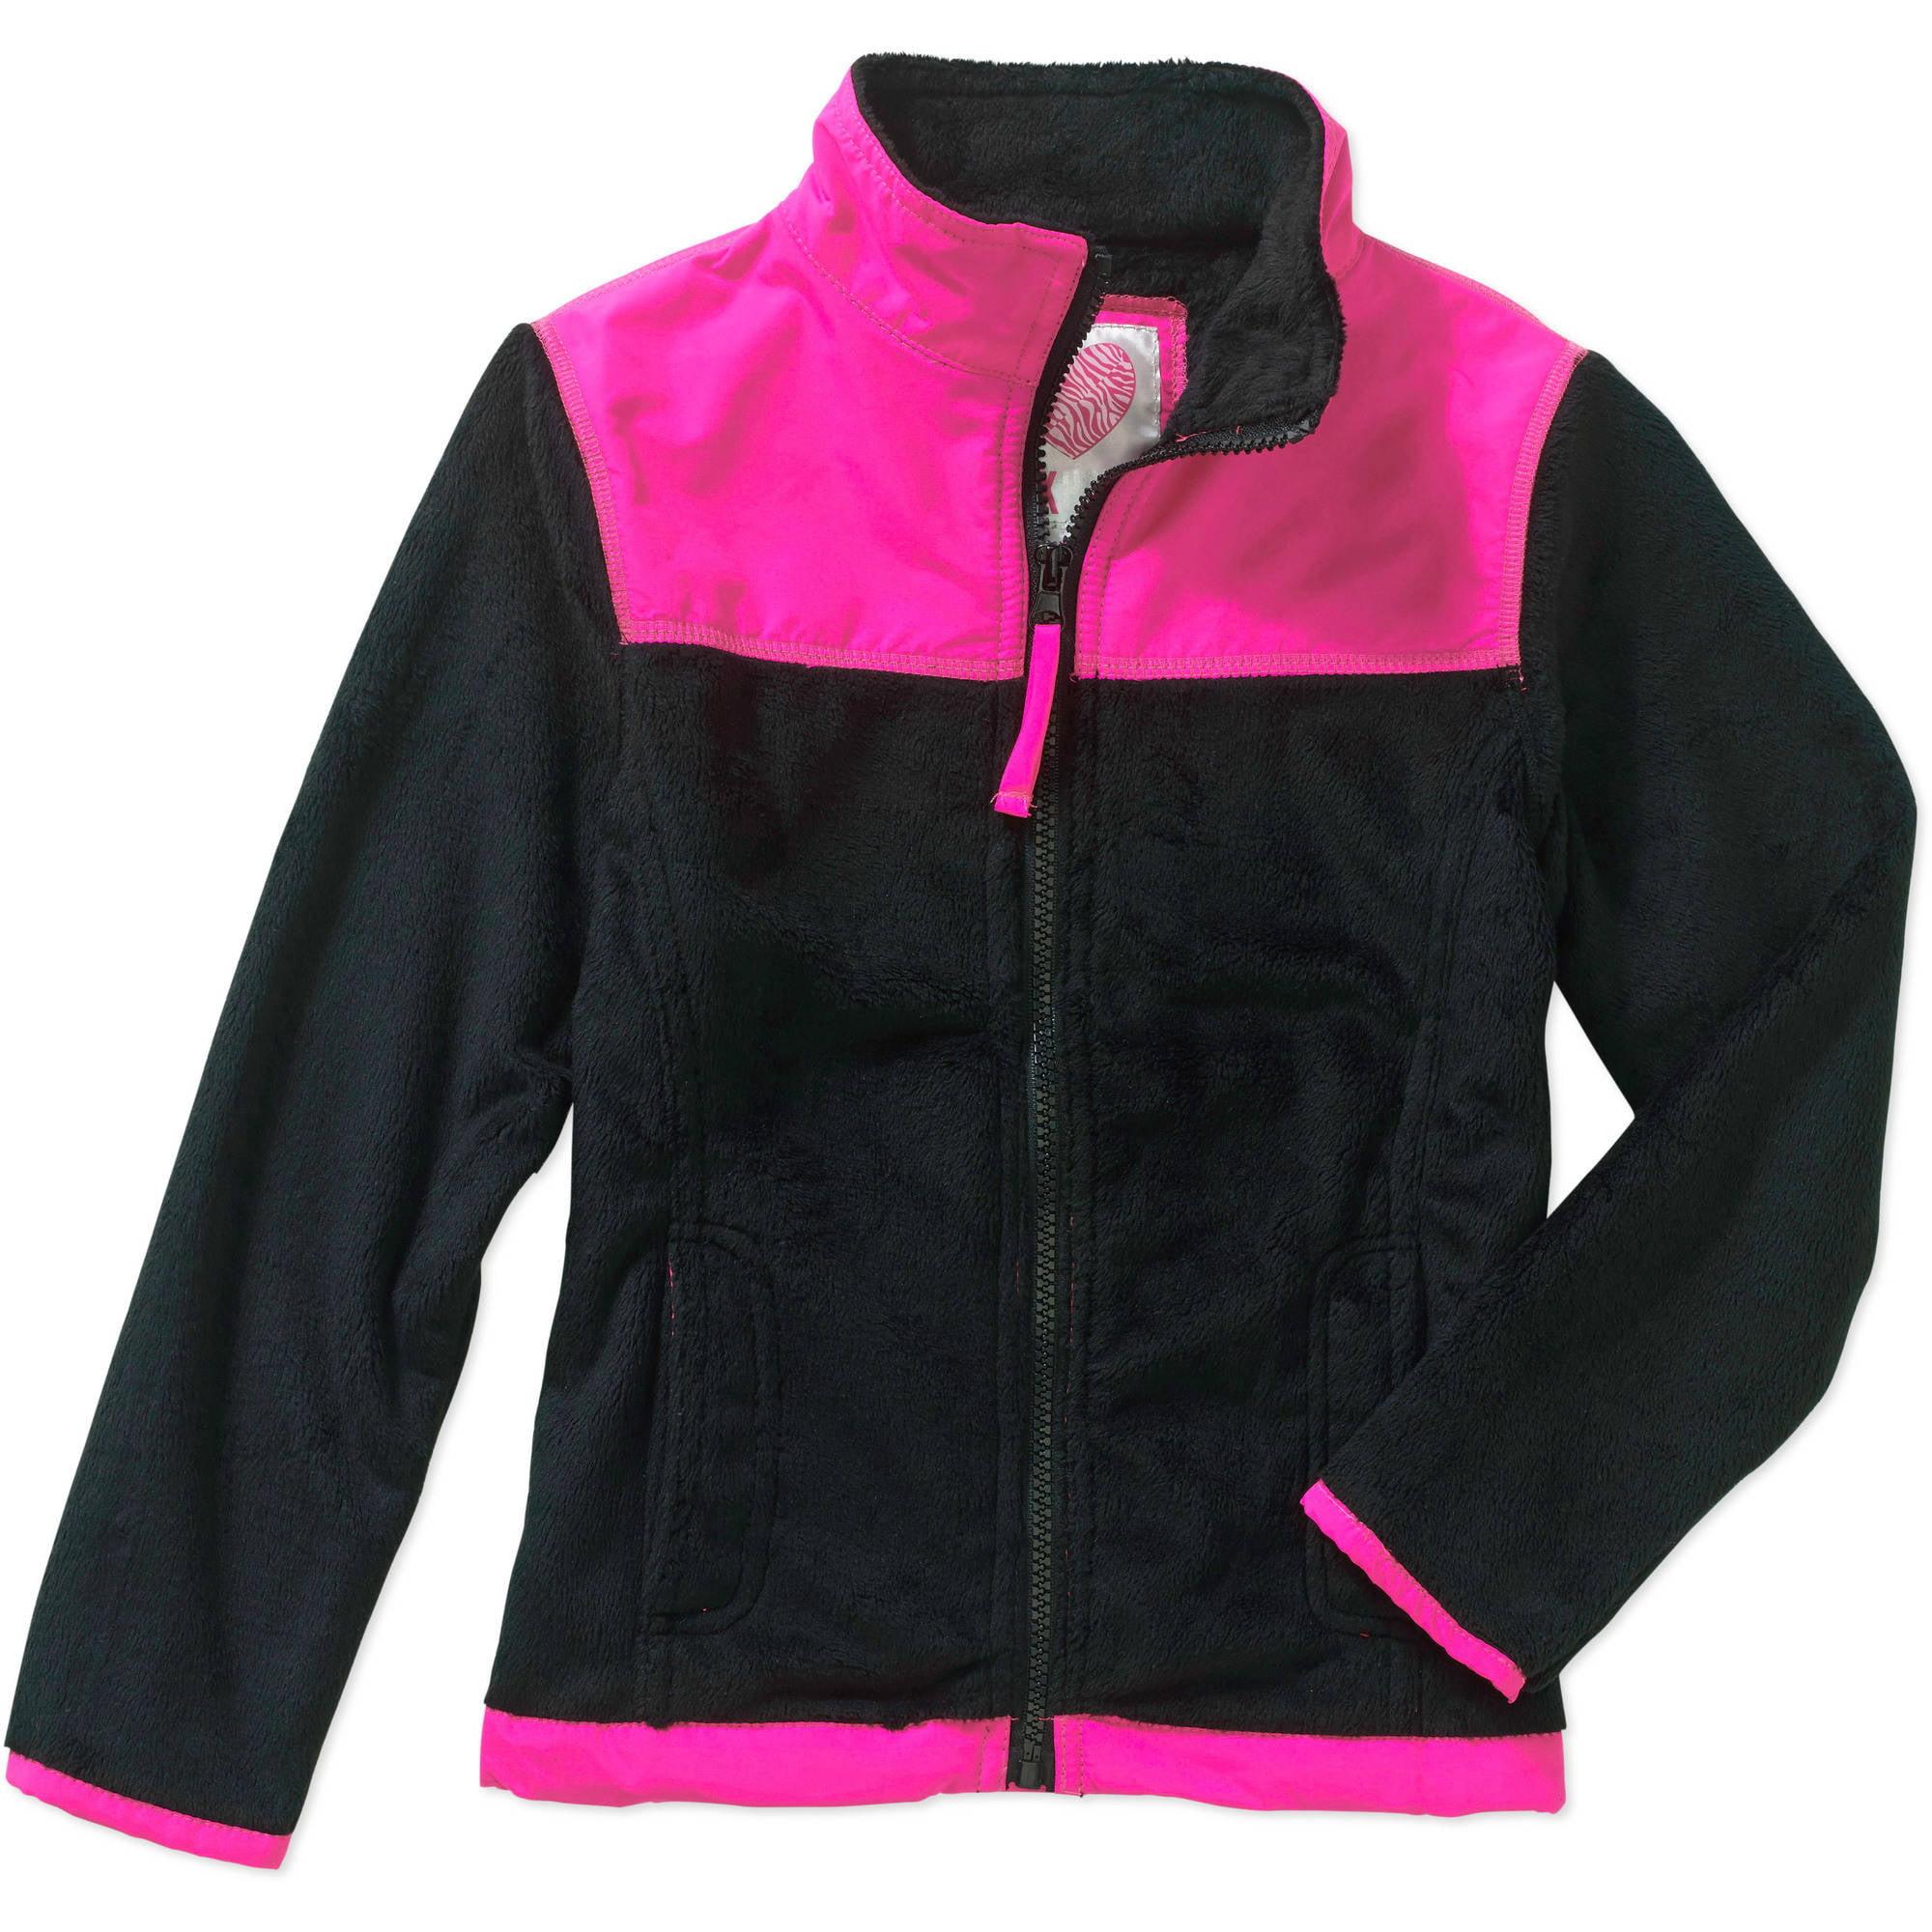 Pink House Girls' Teddy Bear Fleece Jacket - Walmart.com